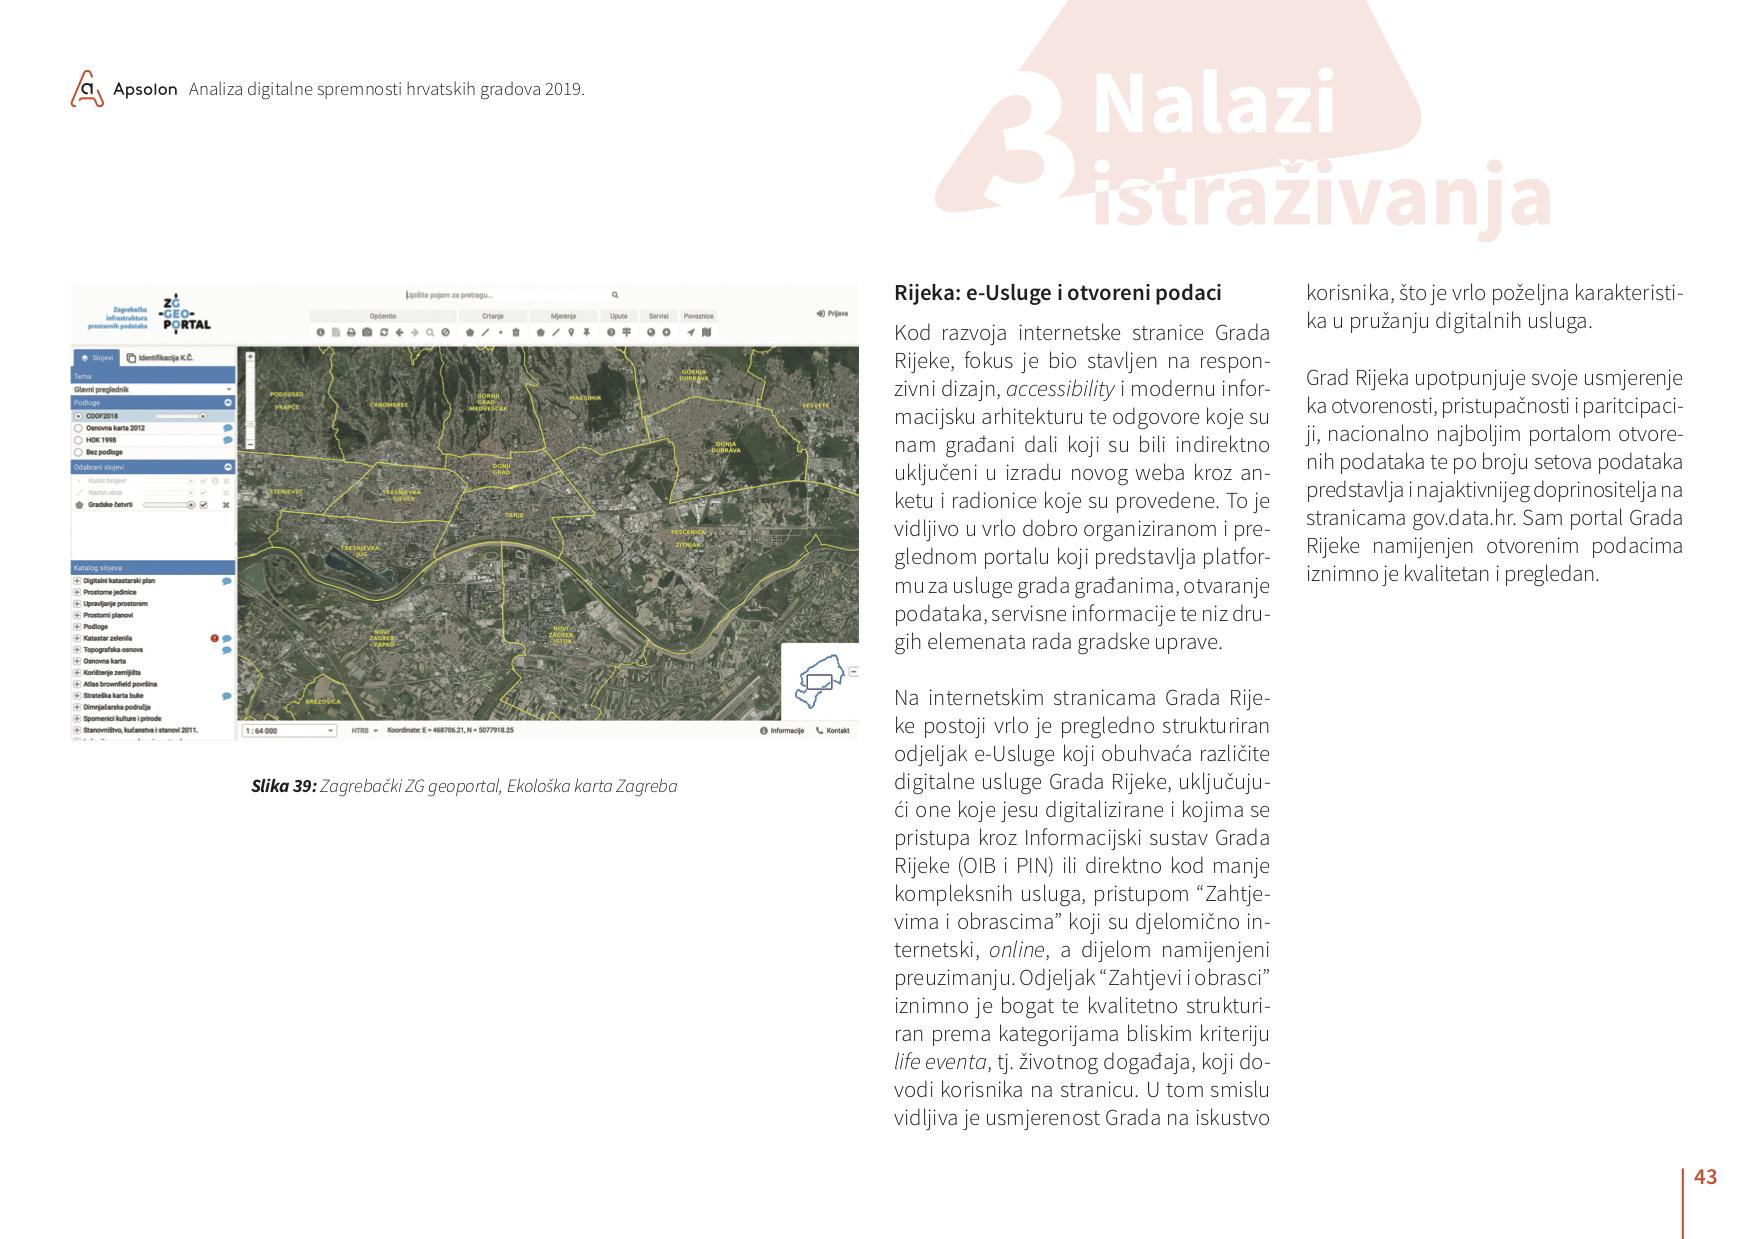 Design Of Apsolon Business Report Ivan Goran Zunar